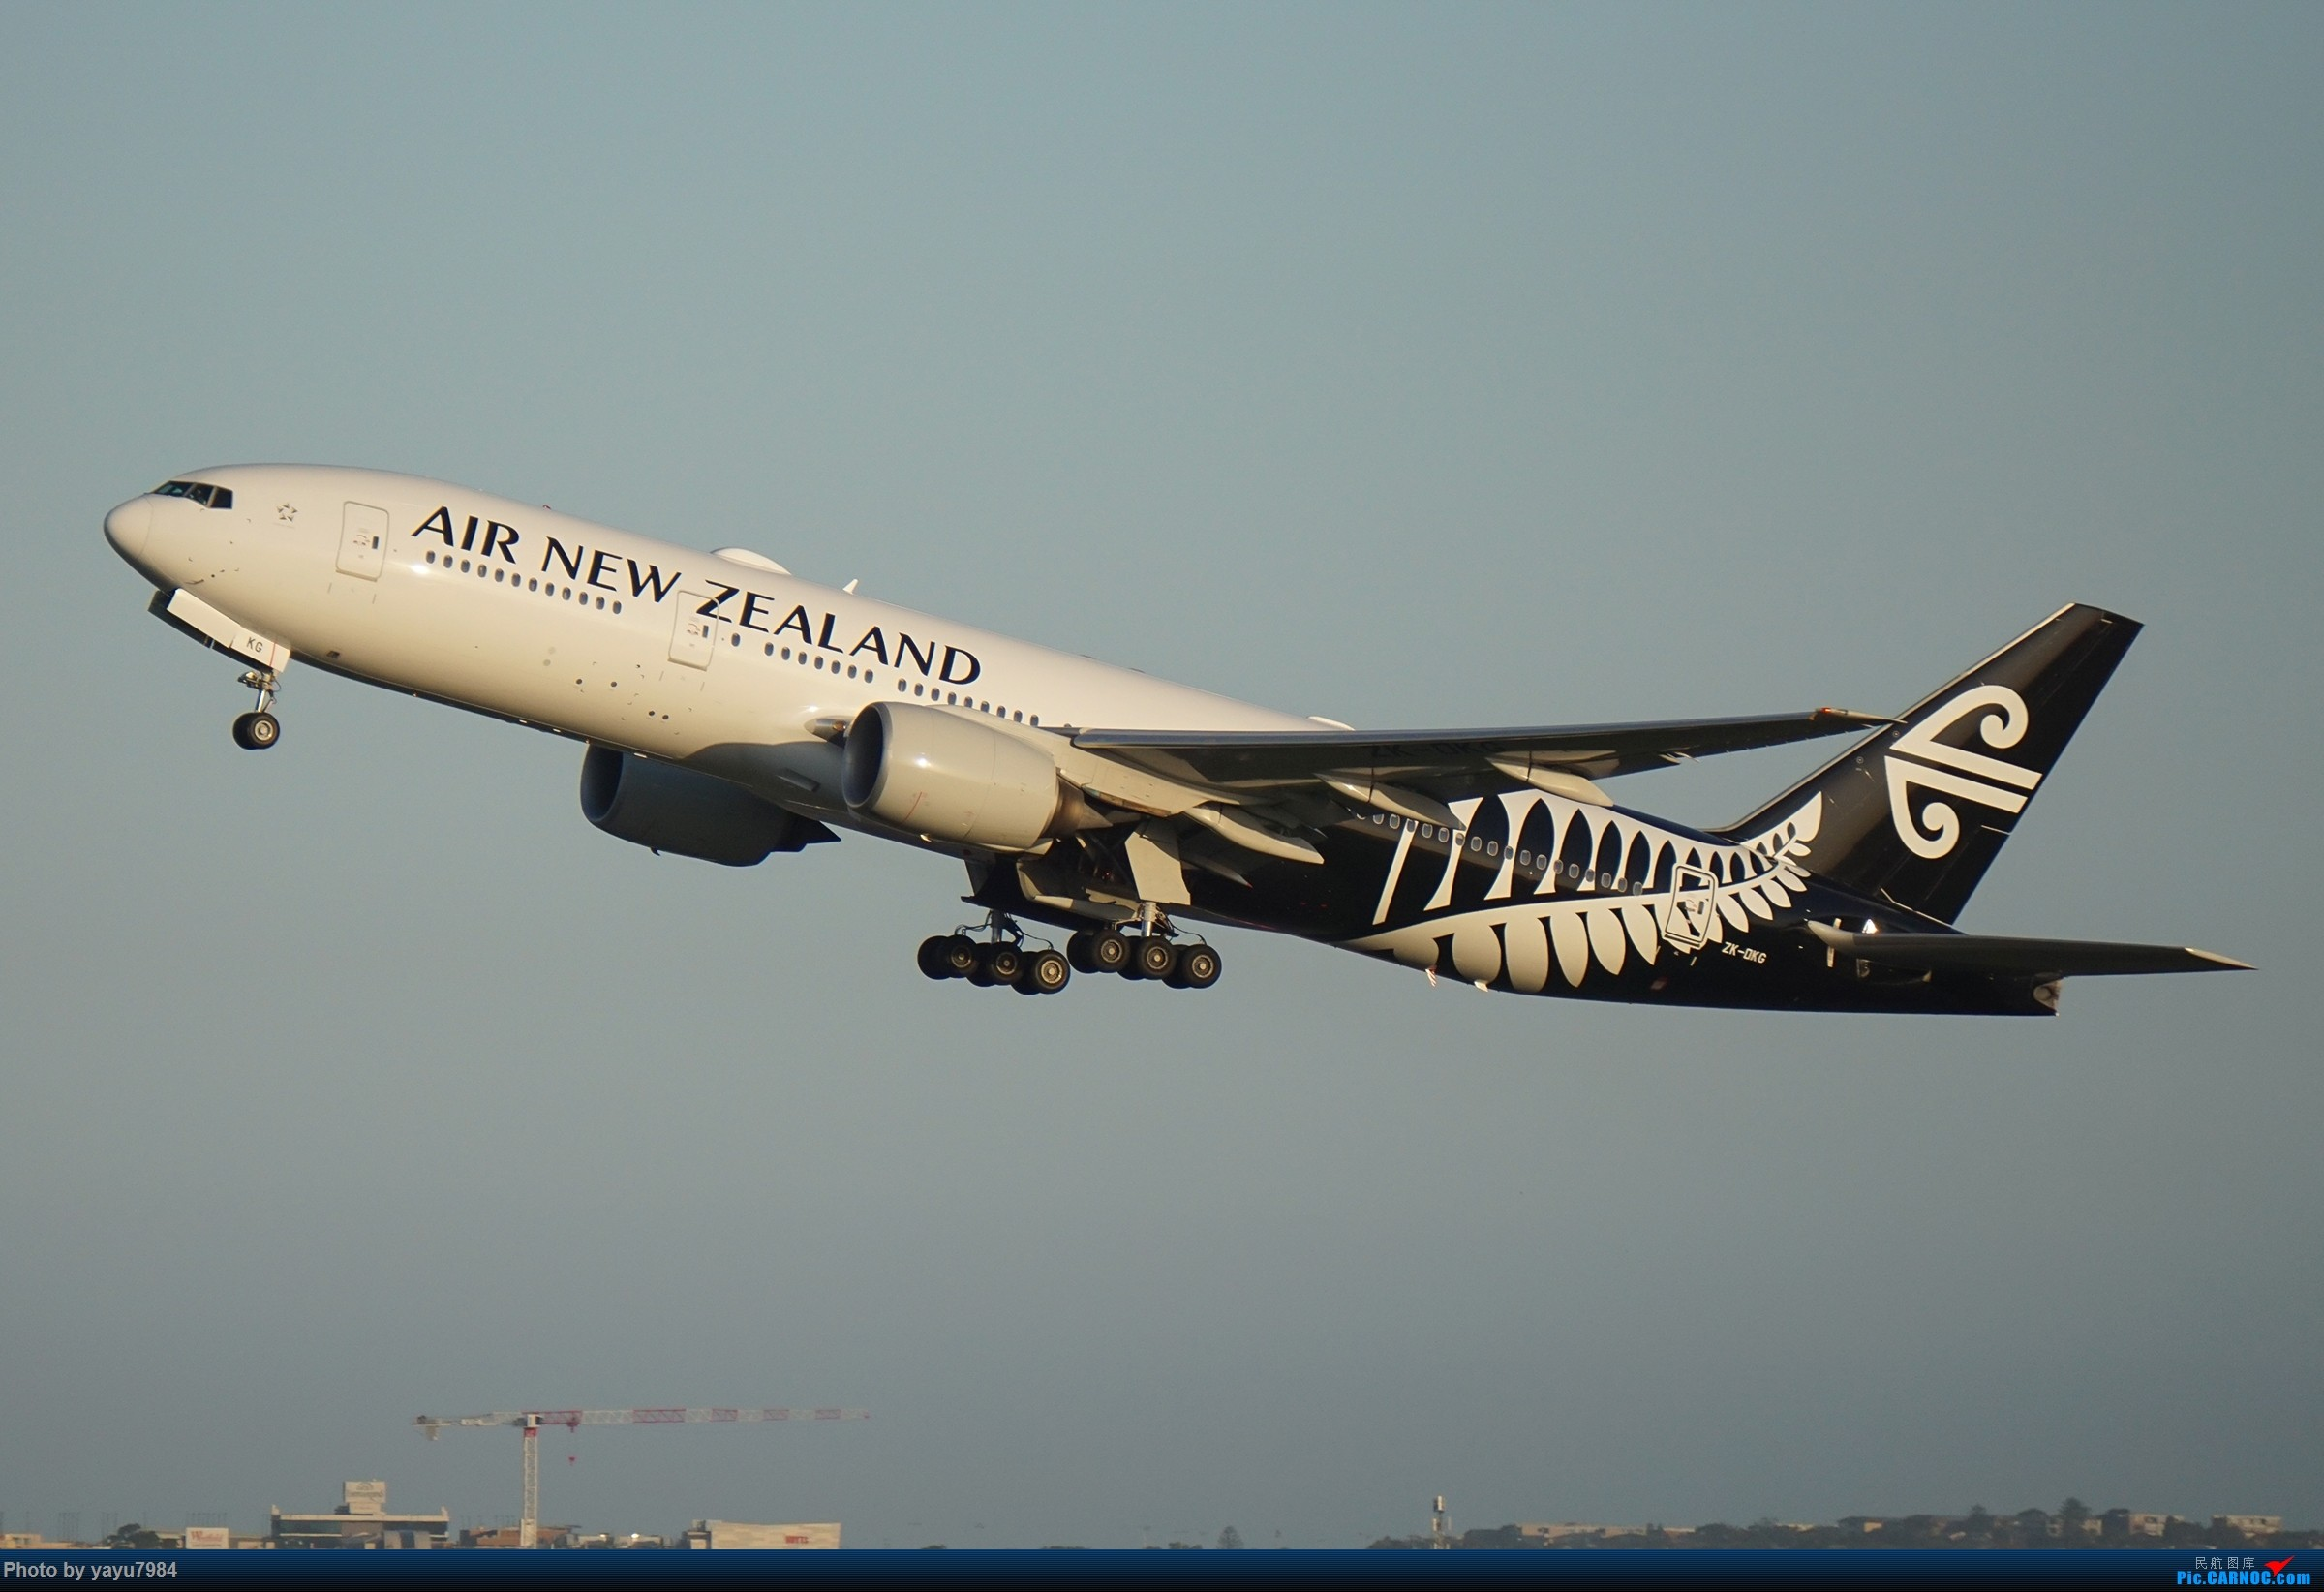 Re:[原创][SYD] 2019首拍,停车楼视角 BOEING 777-219(ER) ZK-OKG 澳大利亚悉尼金斯福德·史密斯机场